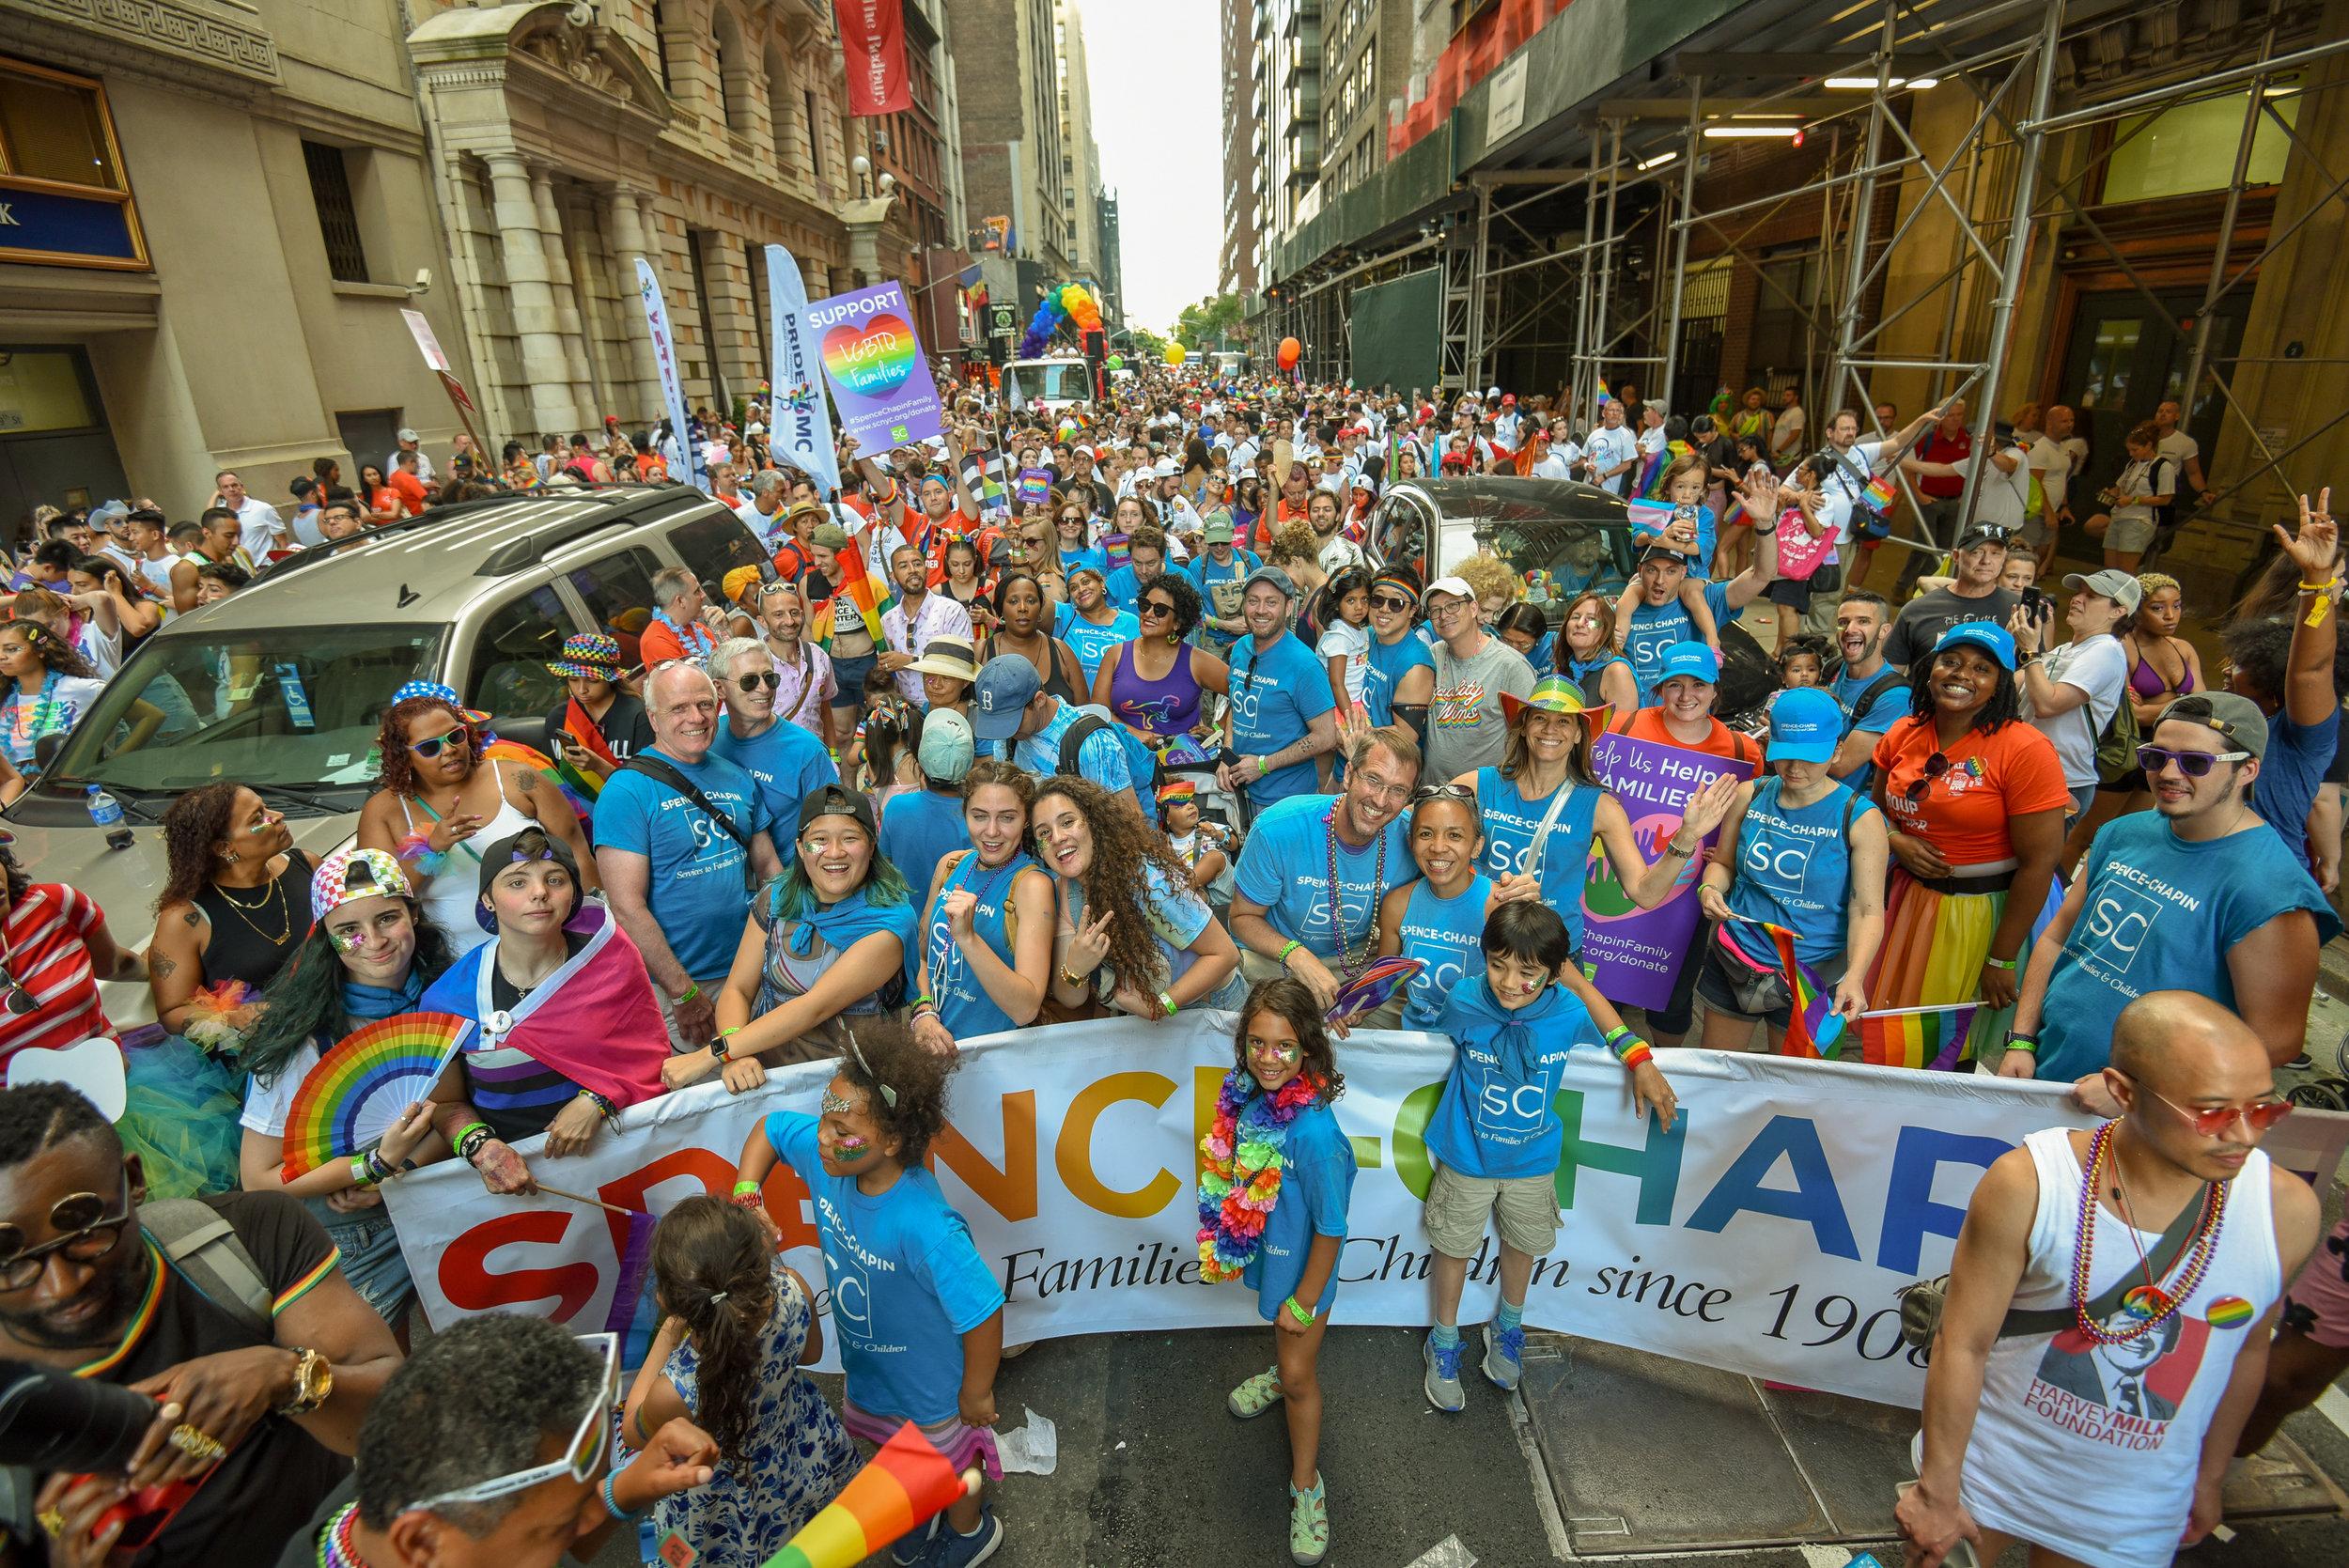 SC-PrideParade-2019_FE-206.jpg